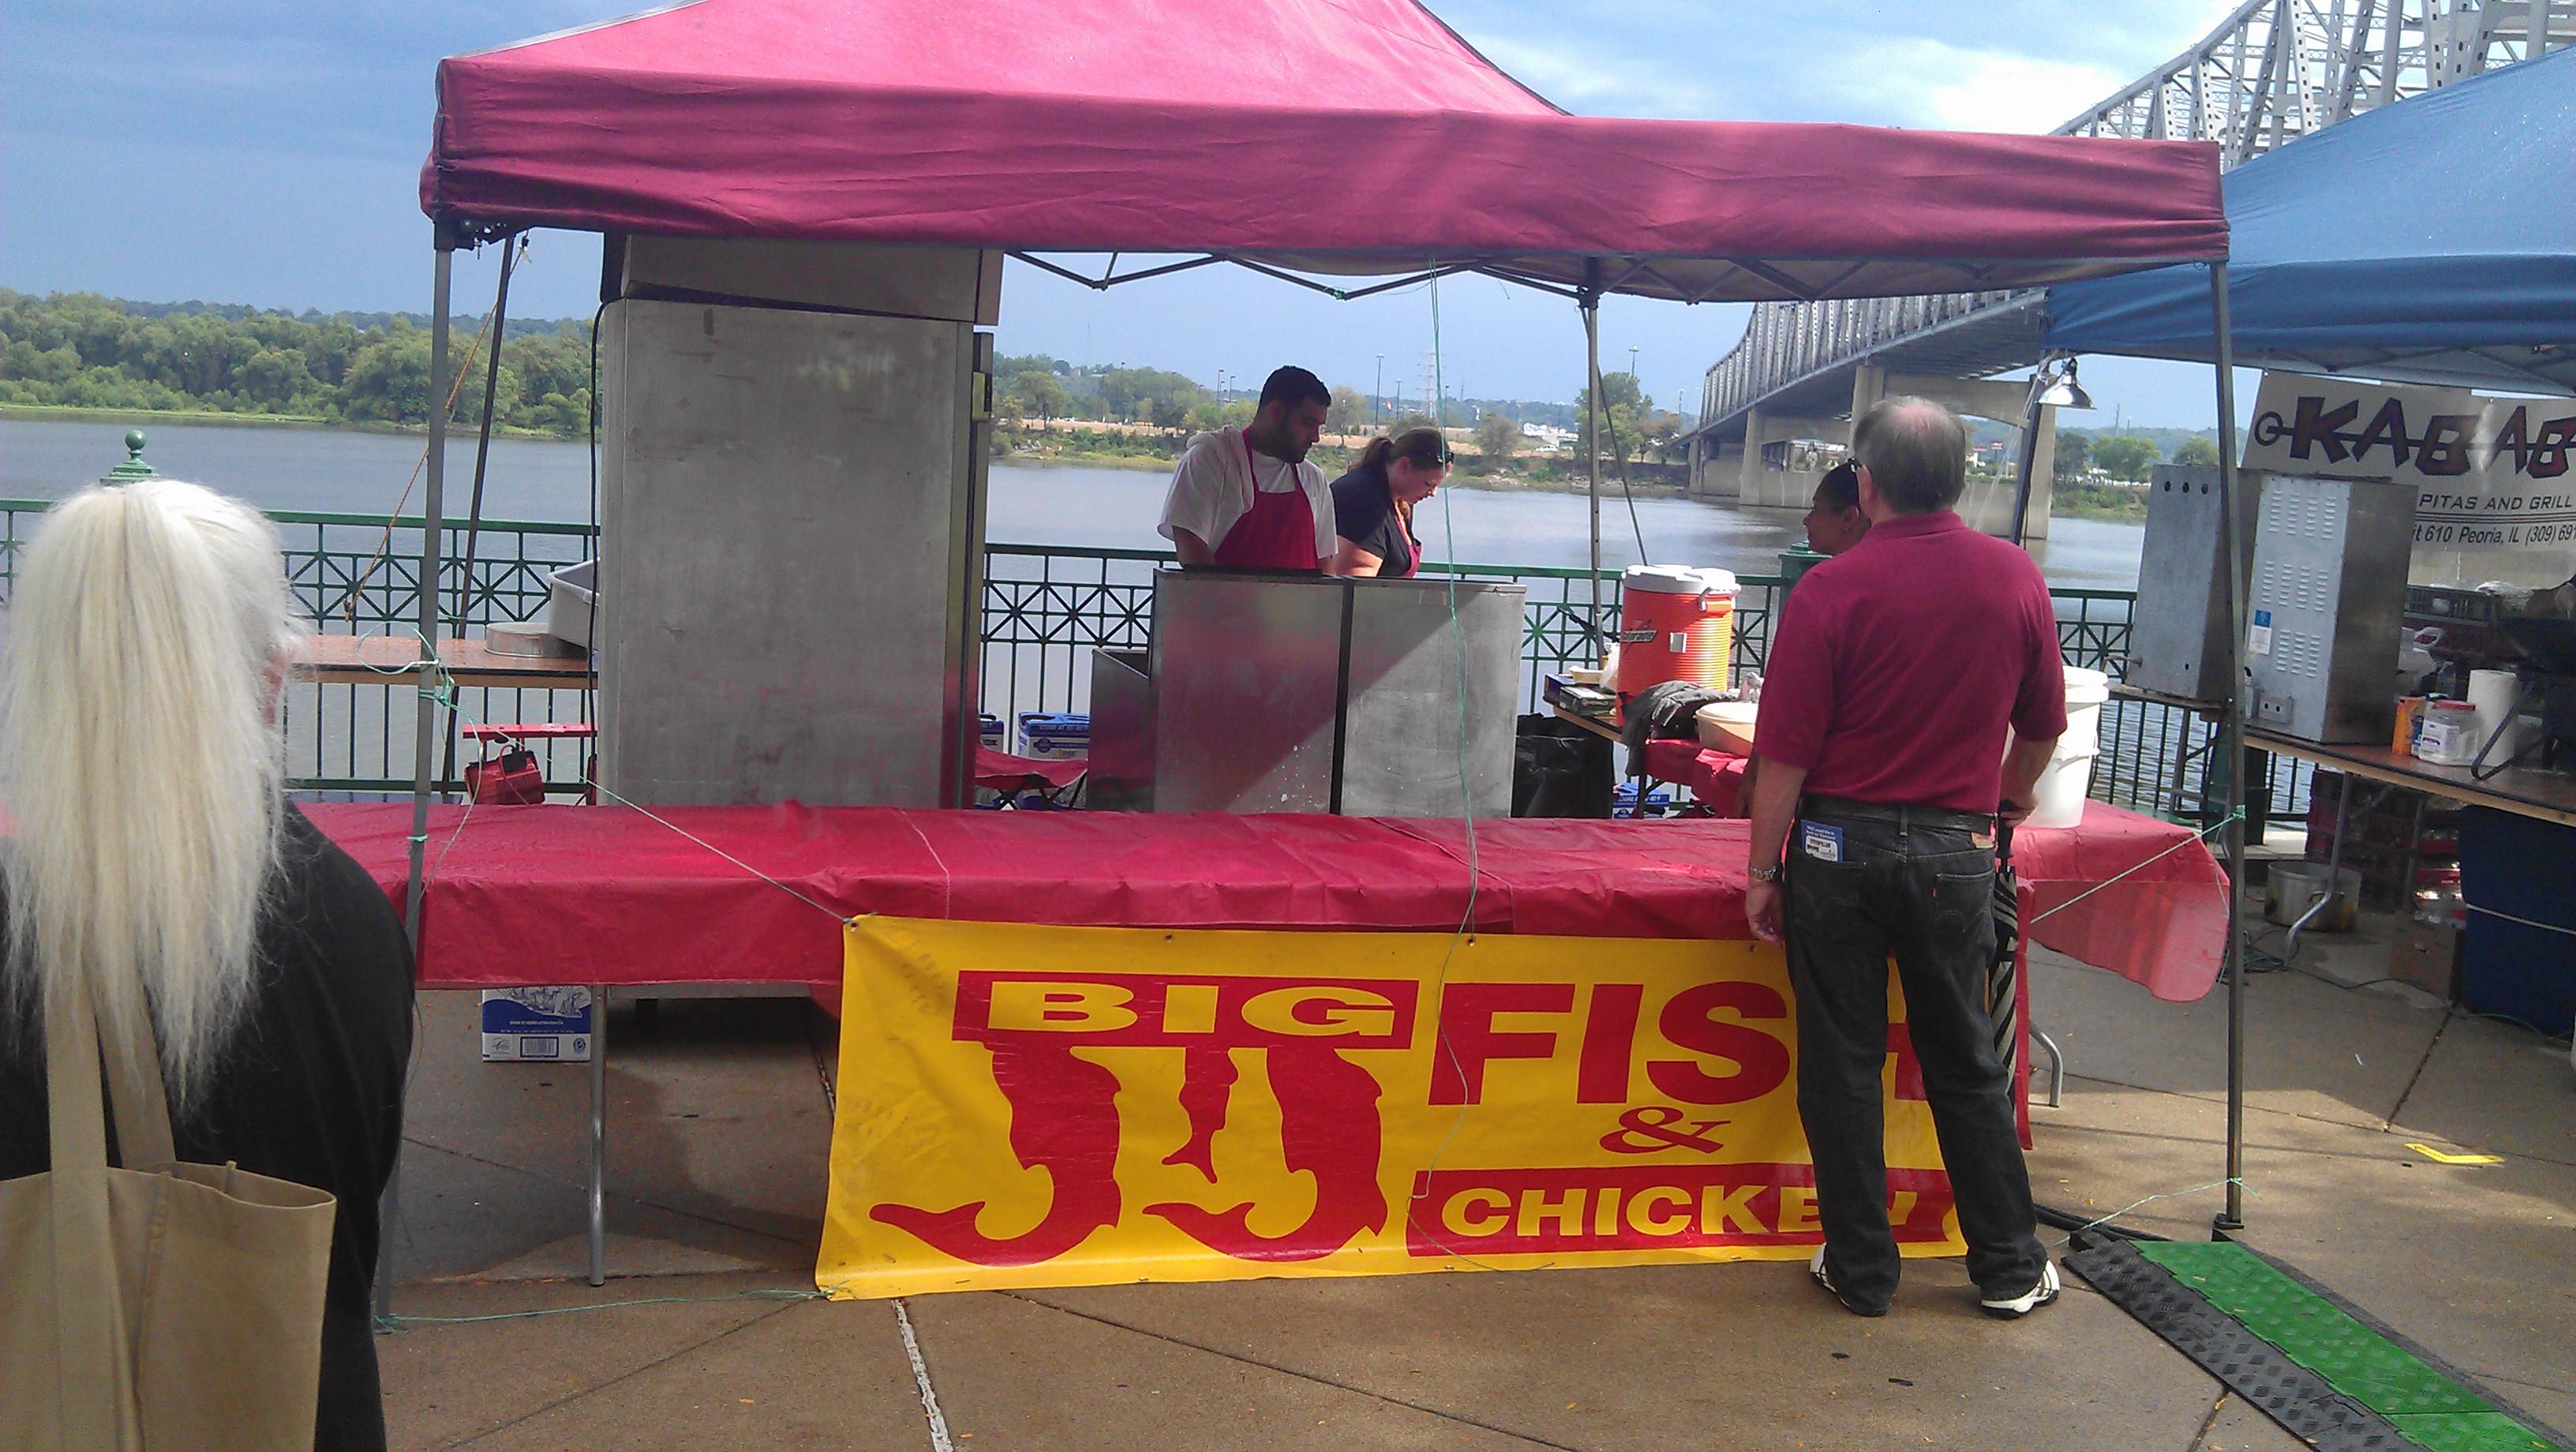 Big jj fish chicken at the 2012 taste of peoria big for Jj chicken and fish menu